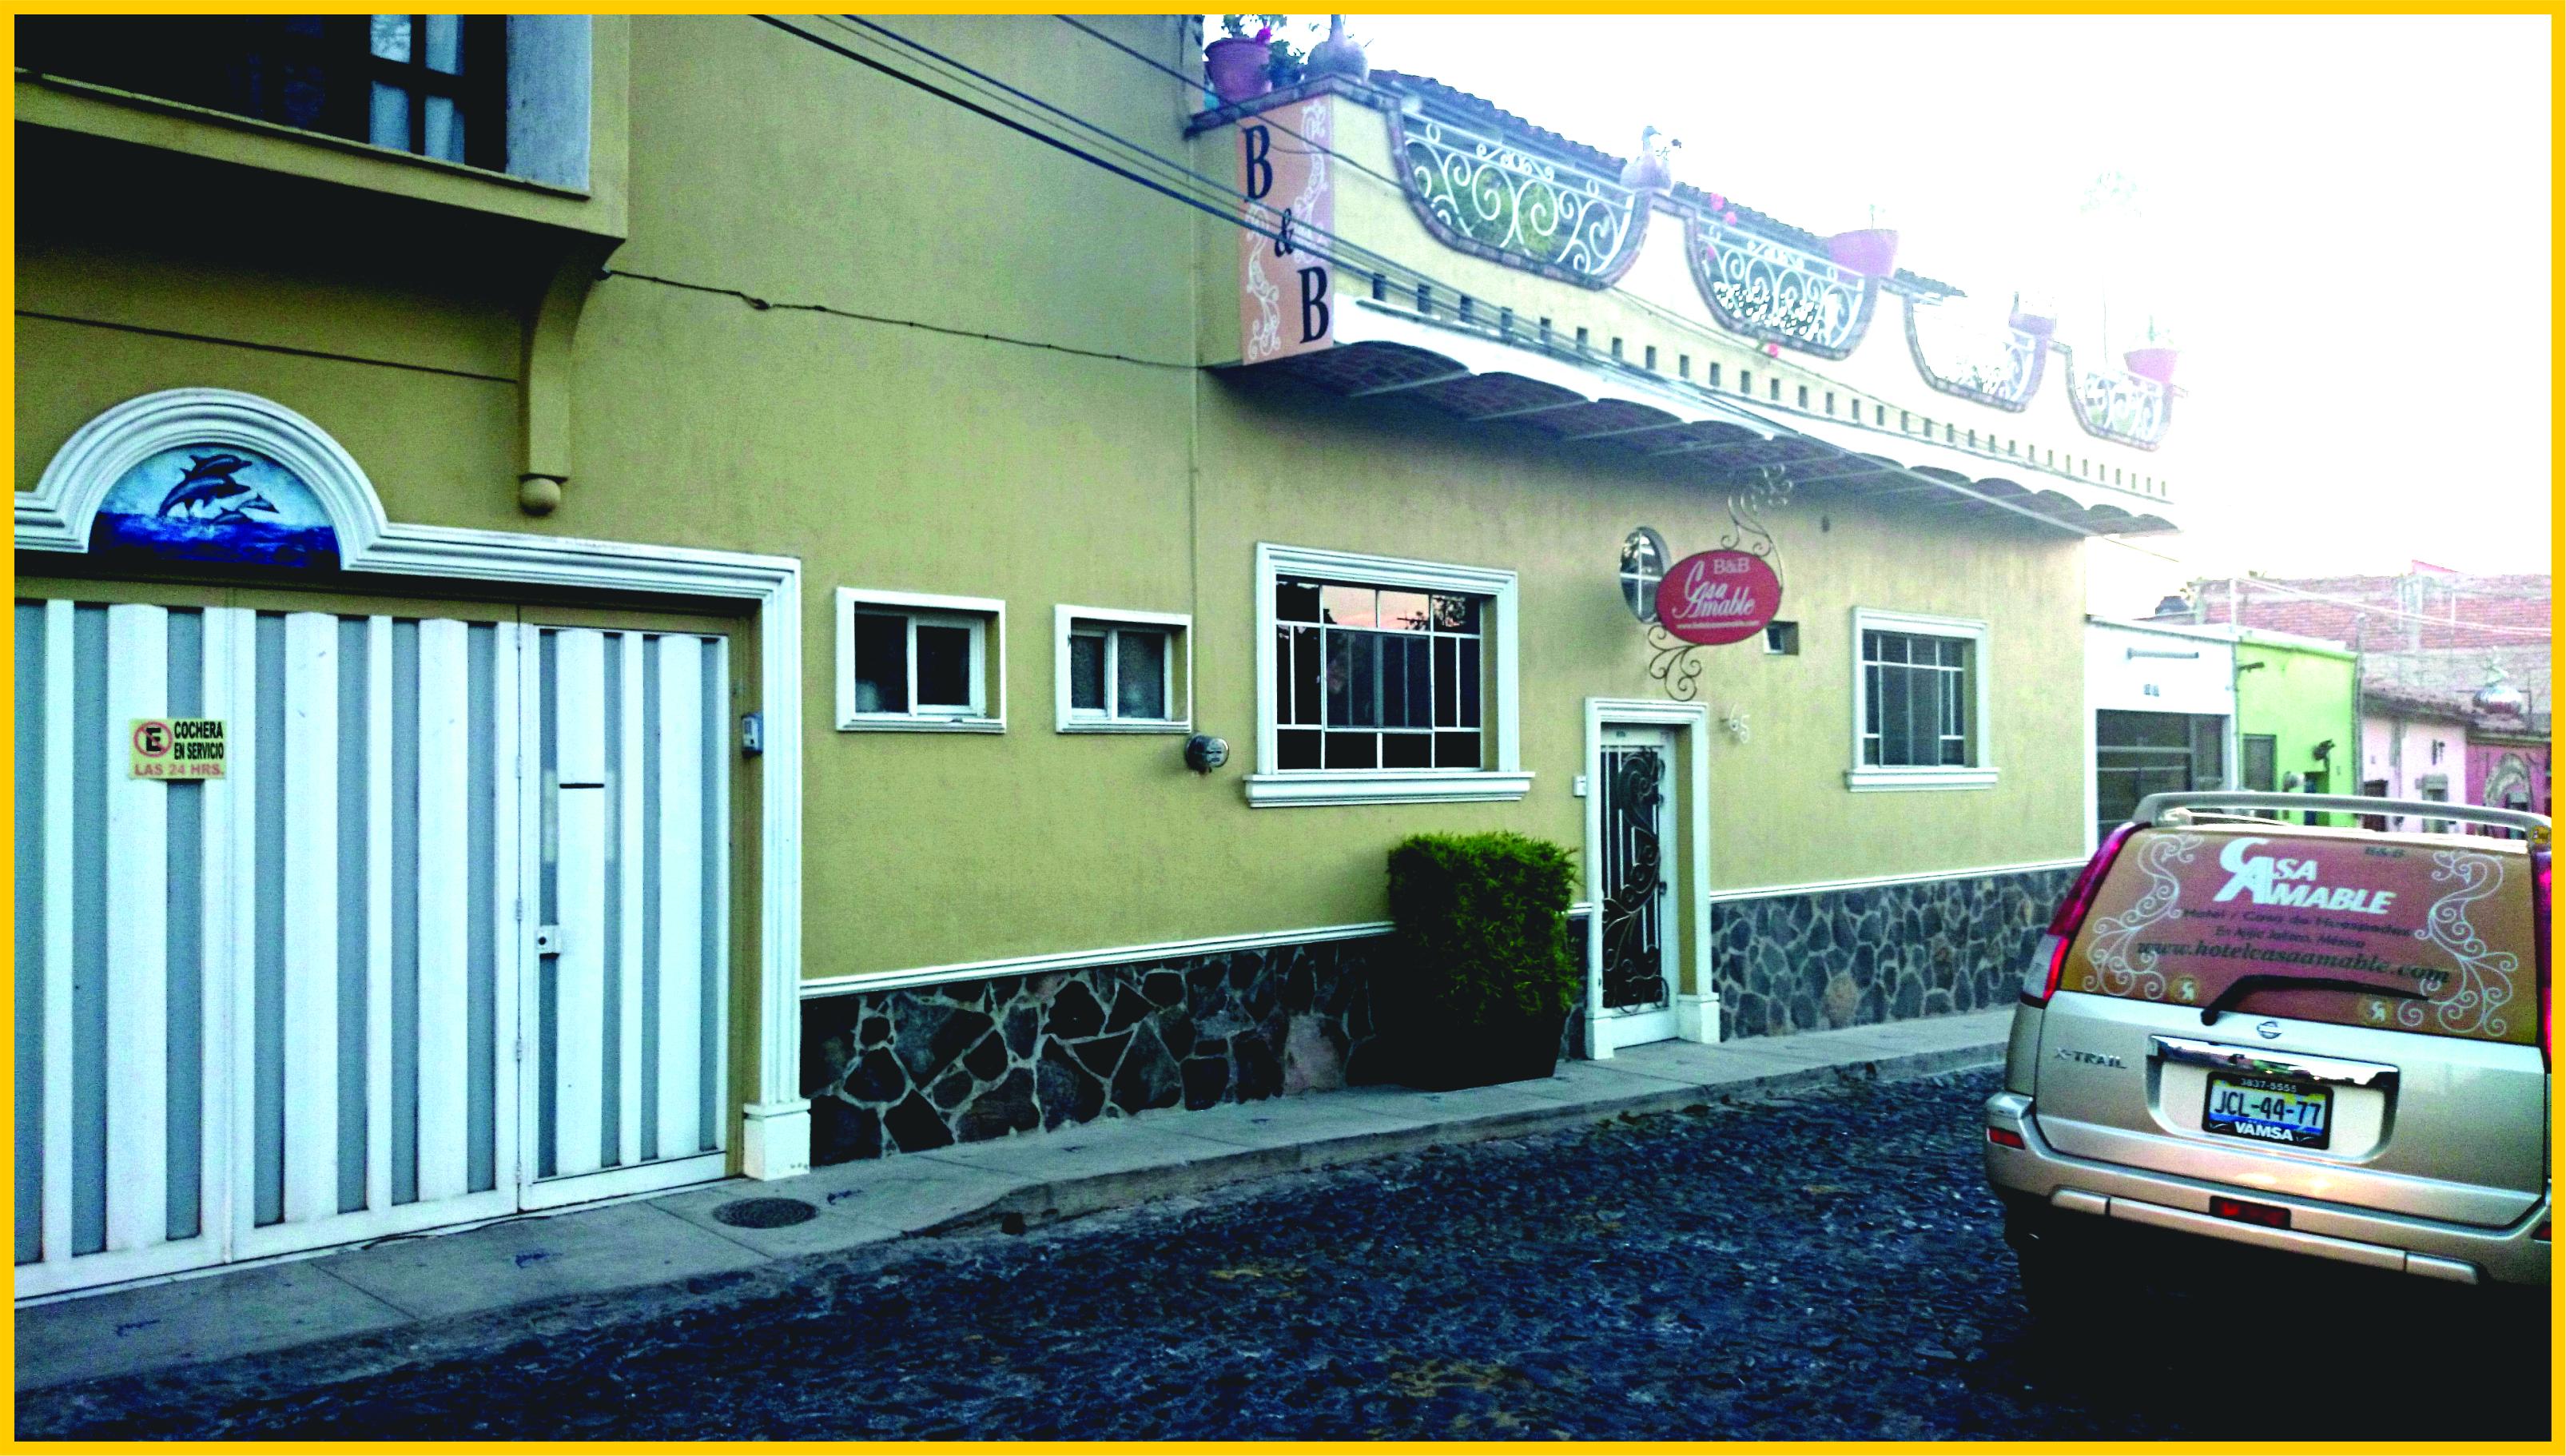 Frente Casa Amable 2015.jpg